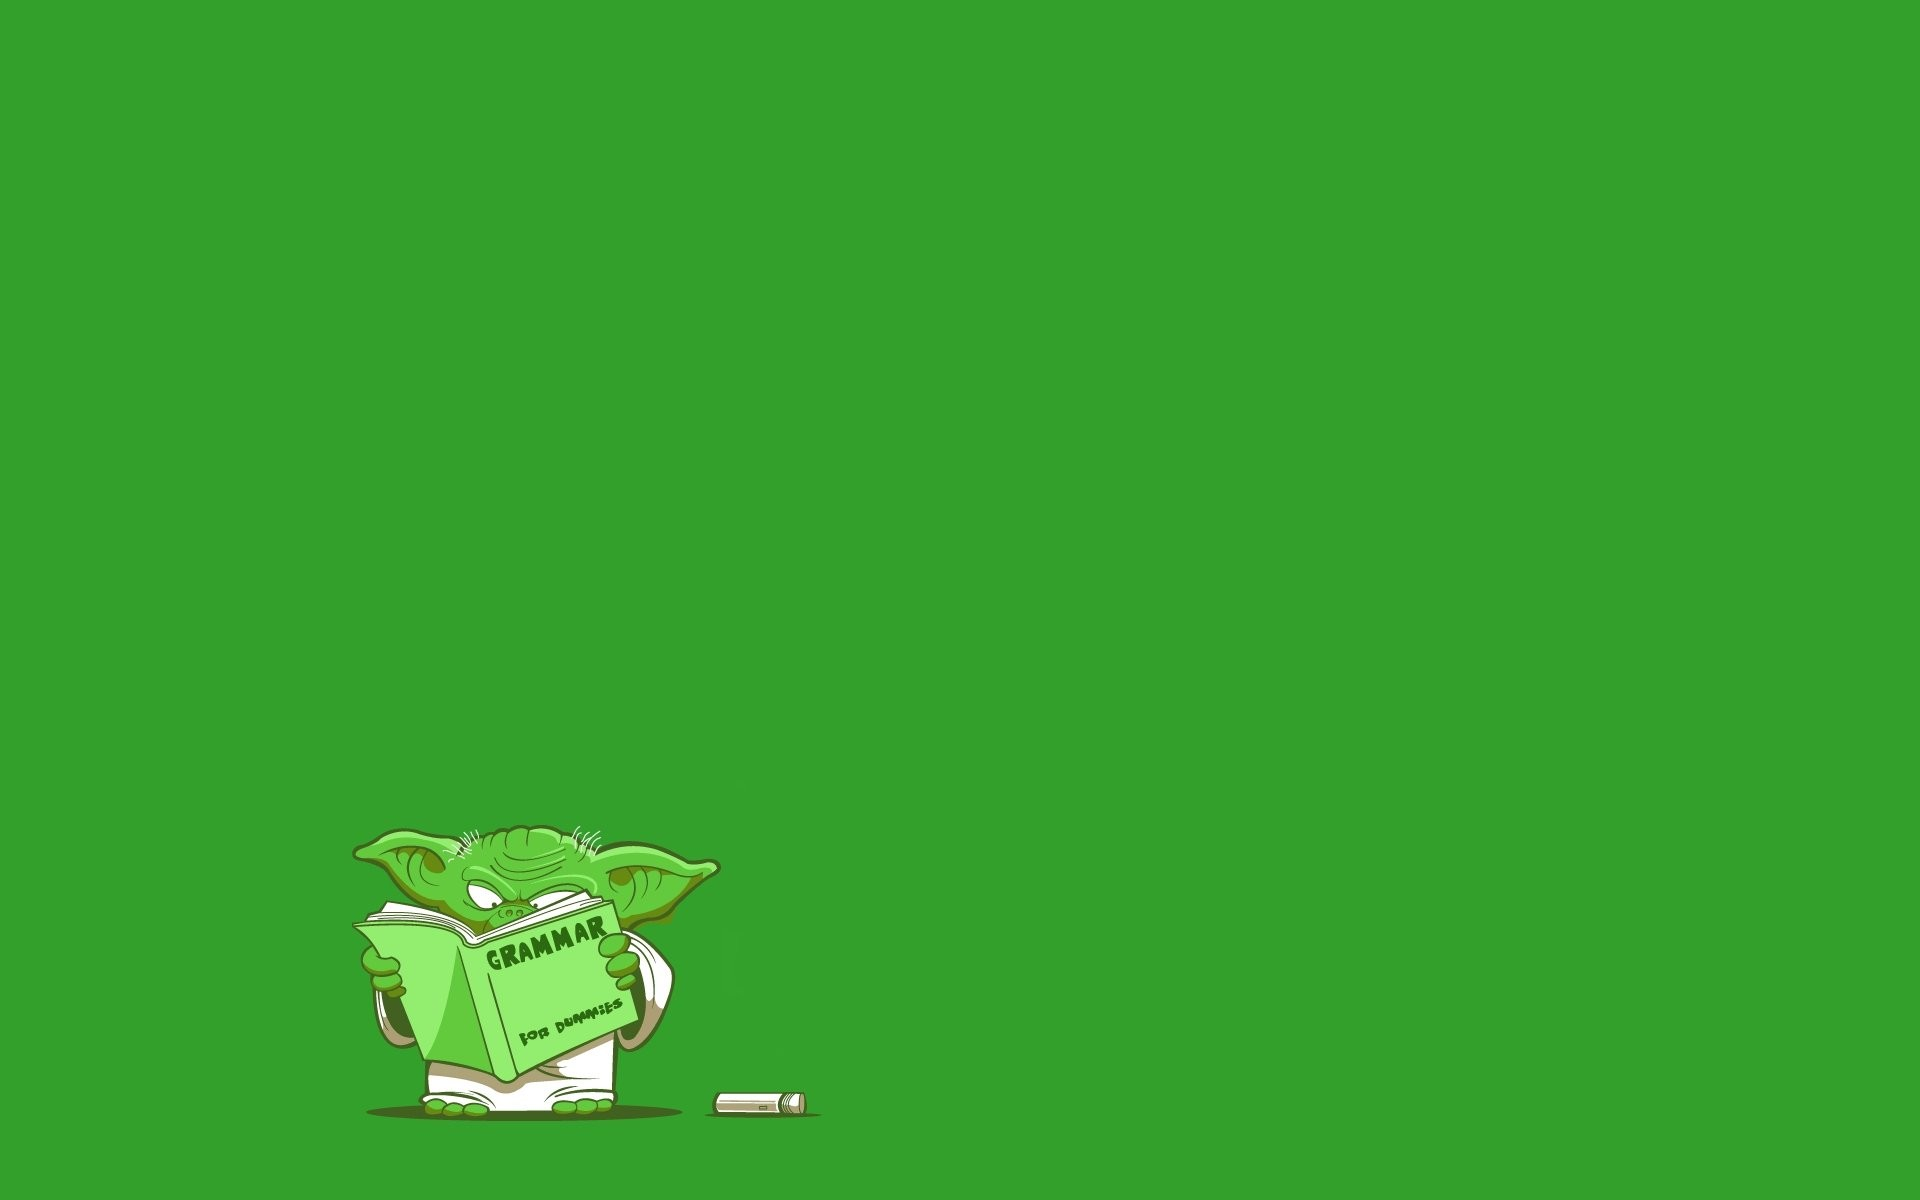 Star Wars artwork Yoda simple background green background wallpaper |  | 284268 | WallpaperUP